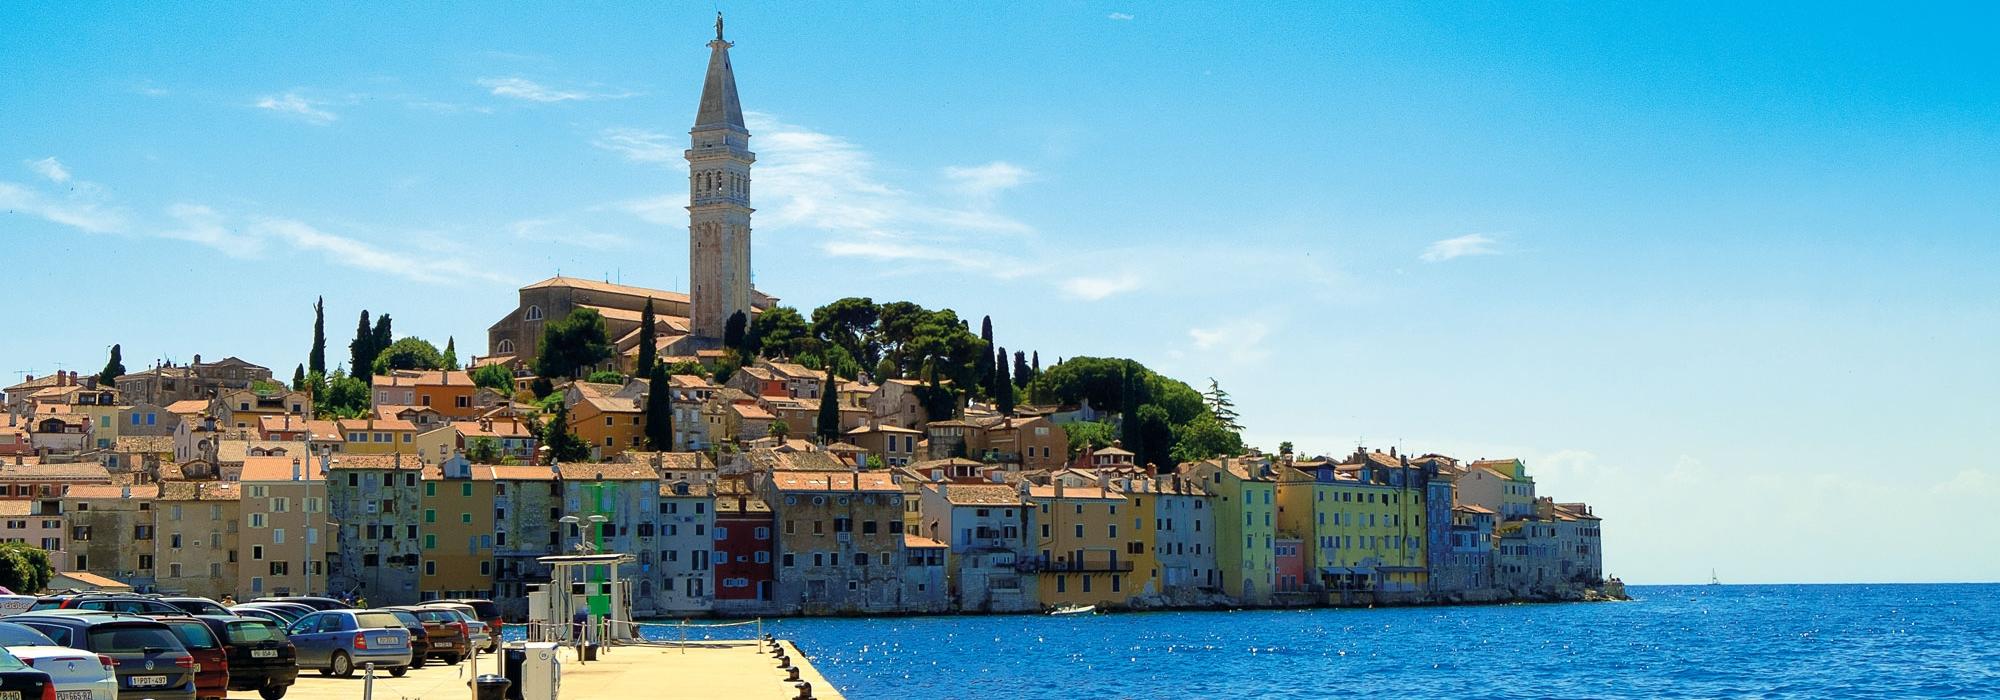 Calendario Adriatic Coast 2021 Istria – the green paradise of the Adriatic Sea | Edelweiss e bike